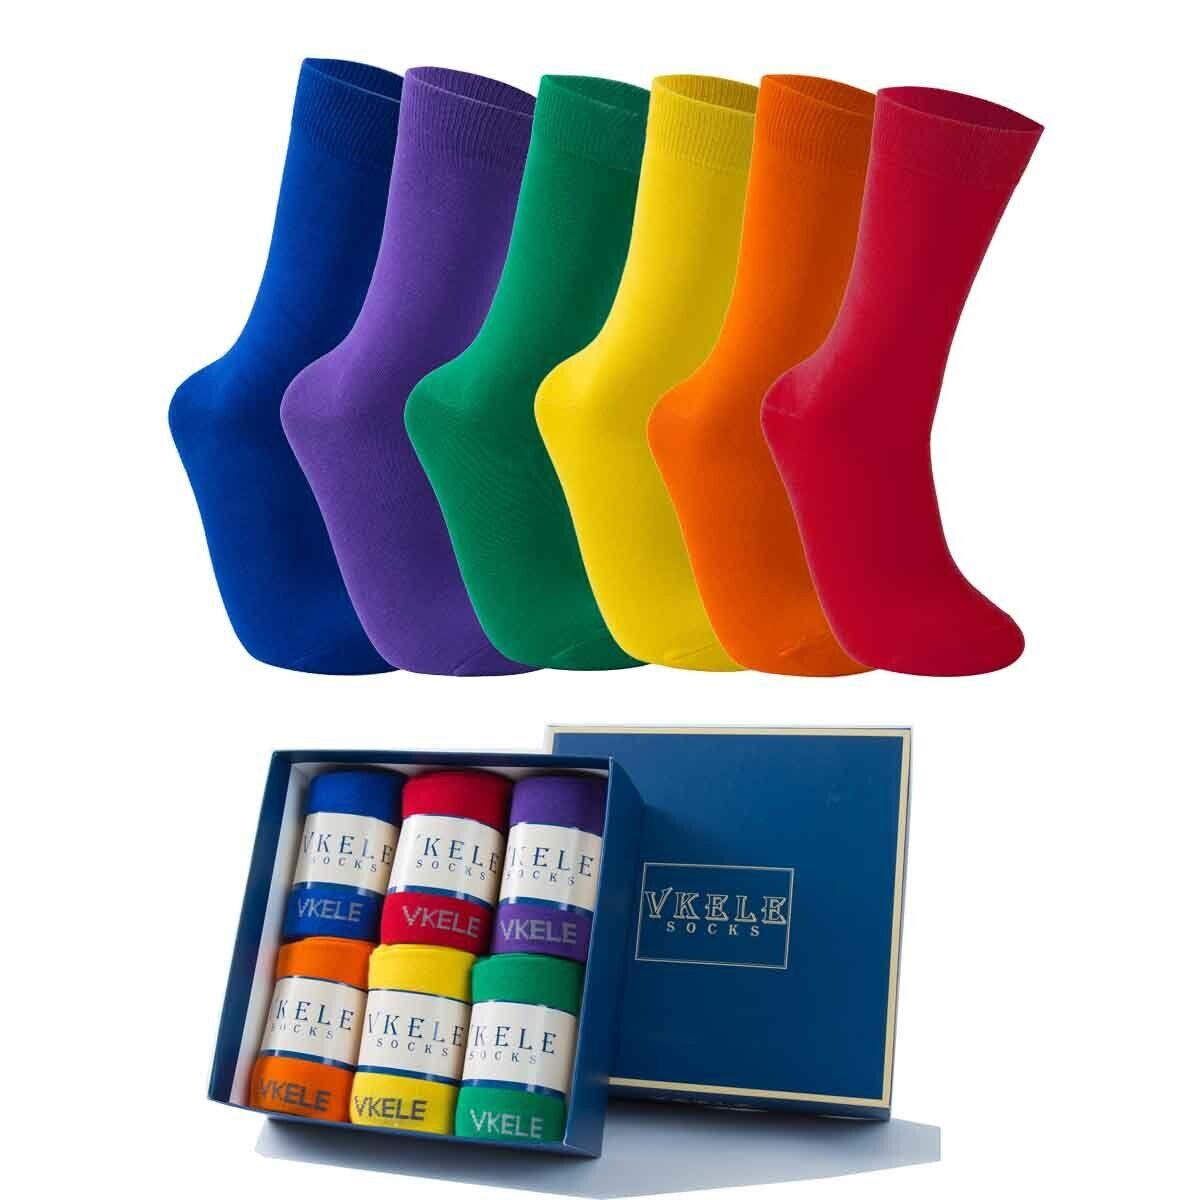 Vkele Crew Socken bunte Herrensocken Business Strümpfe einfarbig 1-6 Paar 39-46